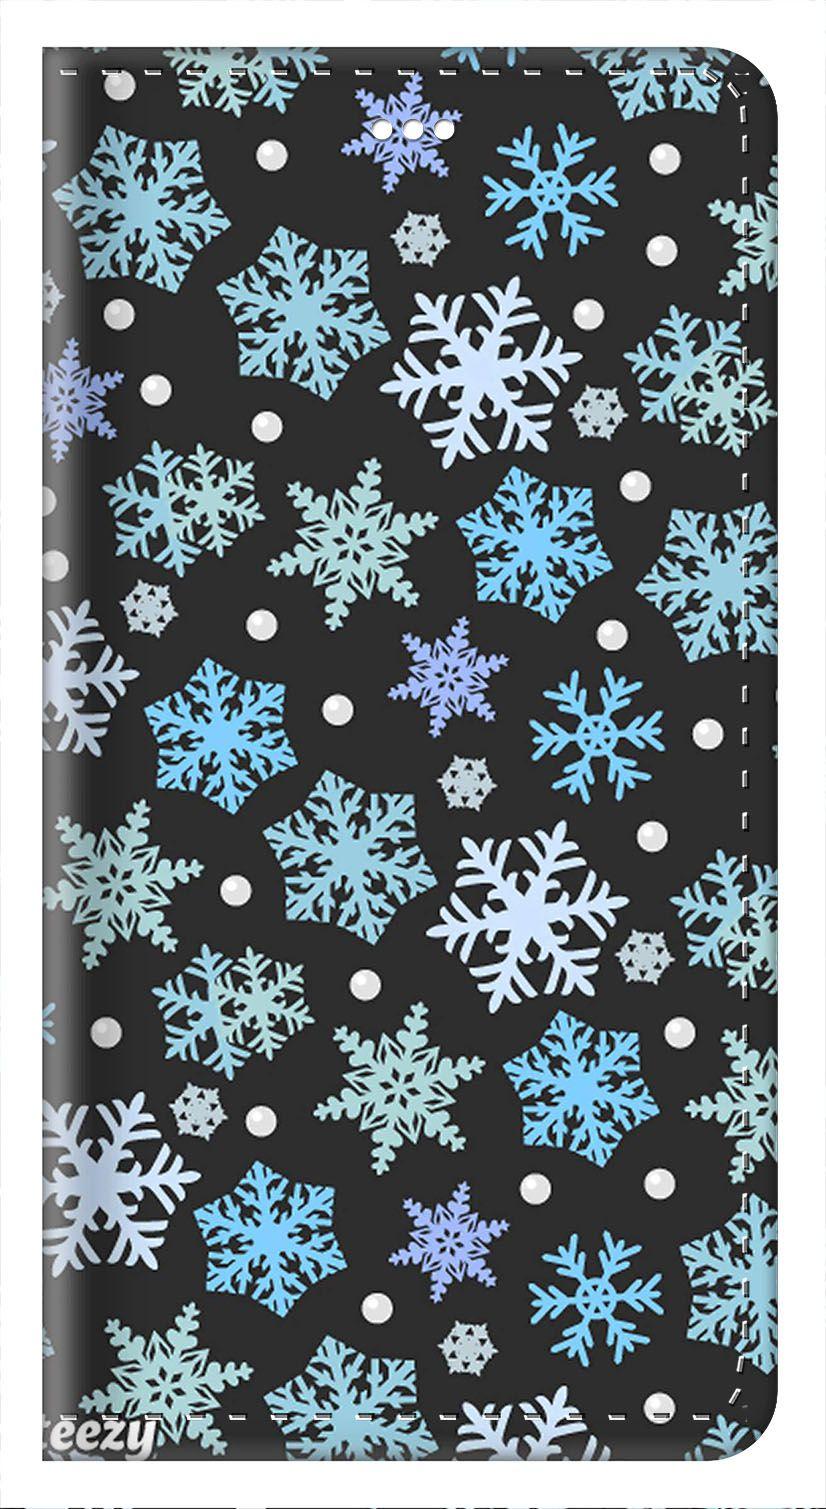 Huawei Honor 7X Flip Cover by ZAPCASE - Multi